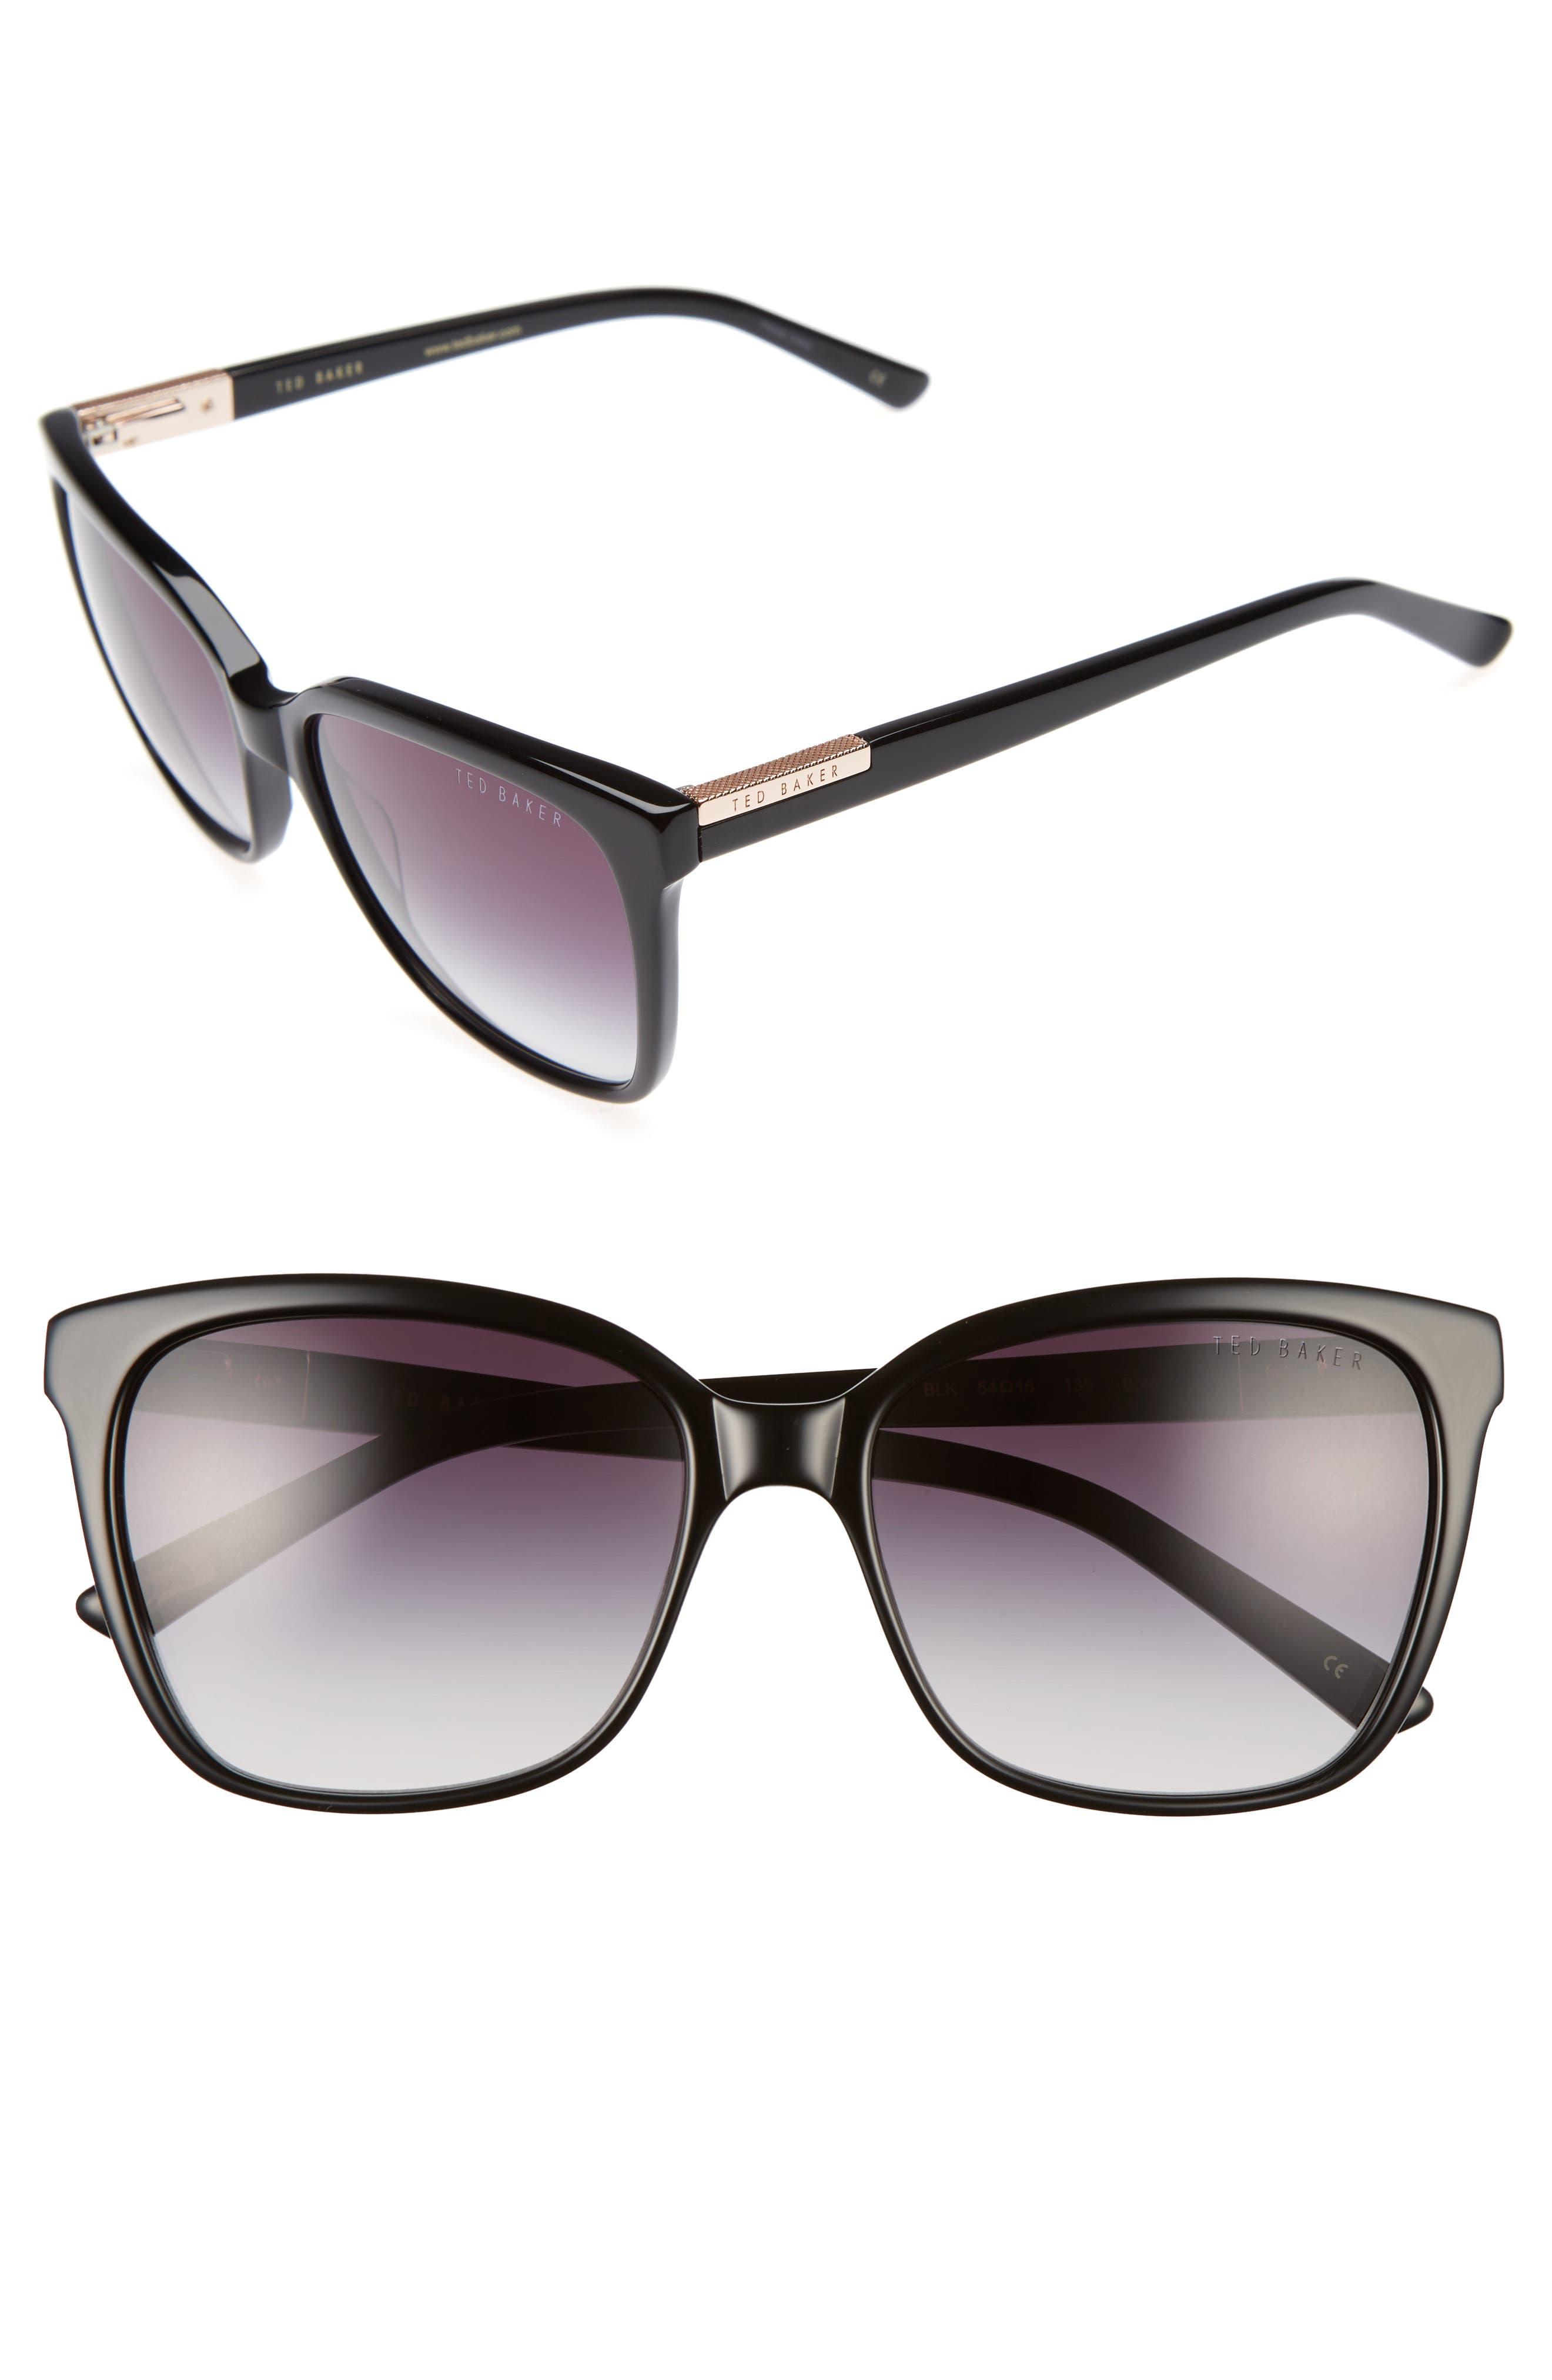 Alternate Image 1 Selected - Ted Baker London 54mm Gradient Lens Square Sunglasses